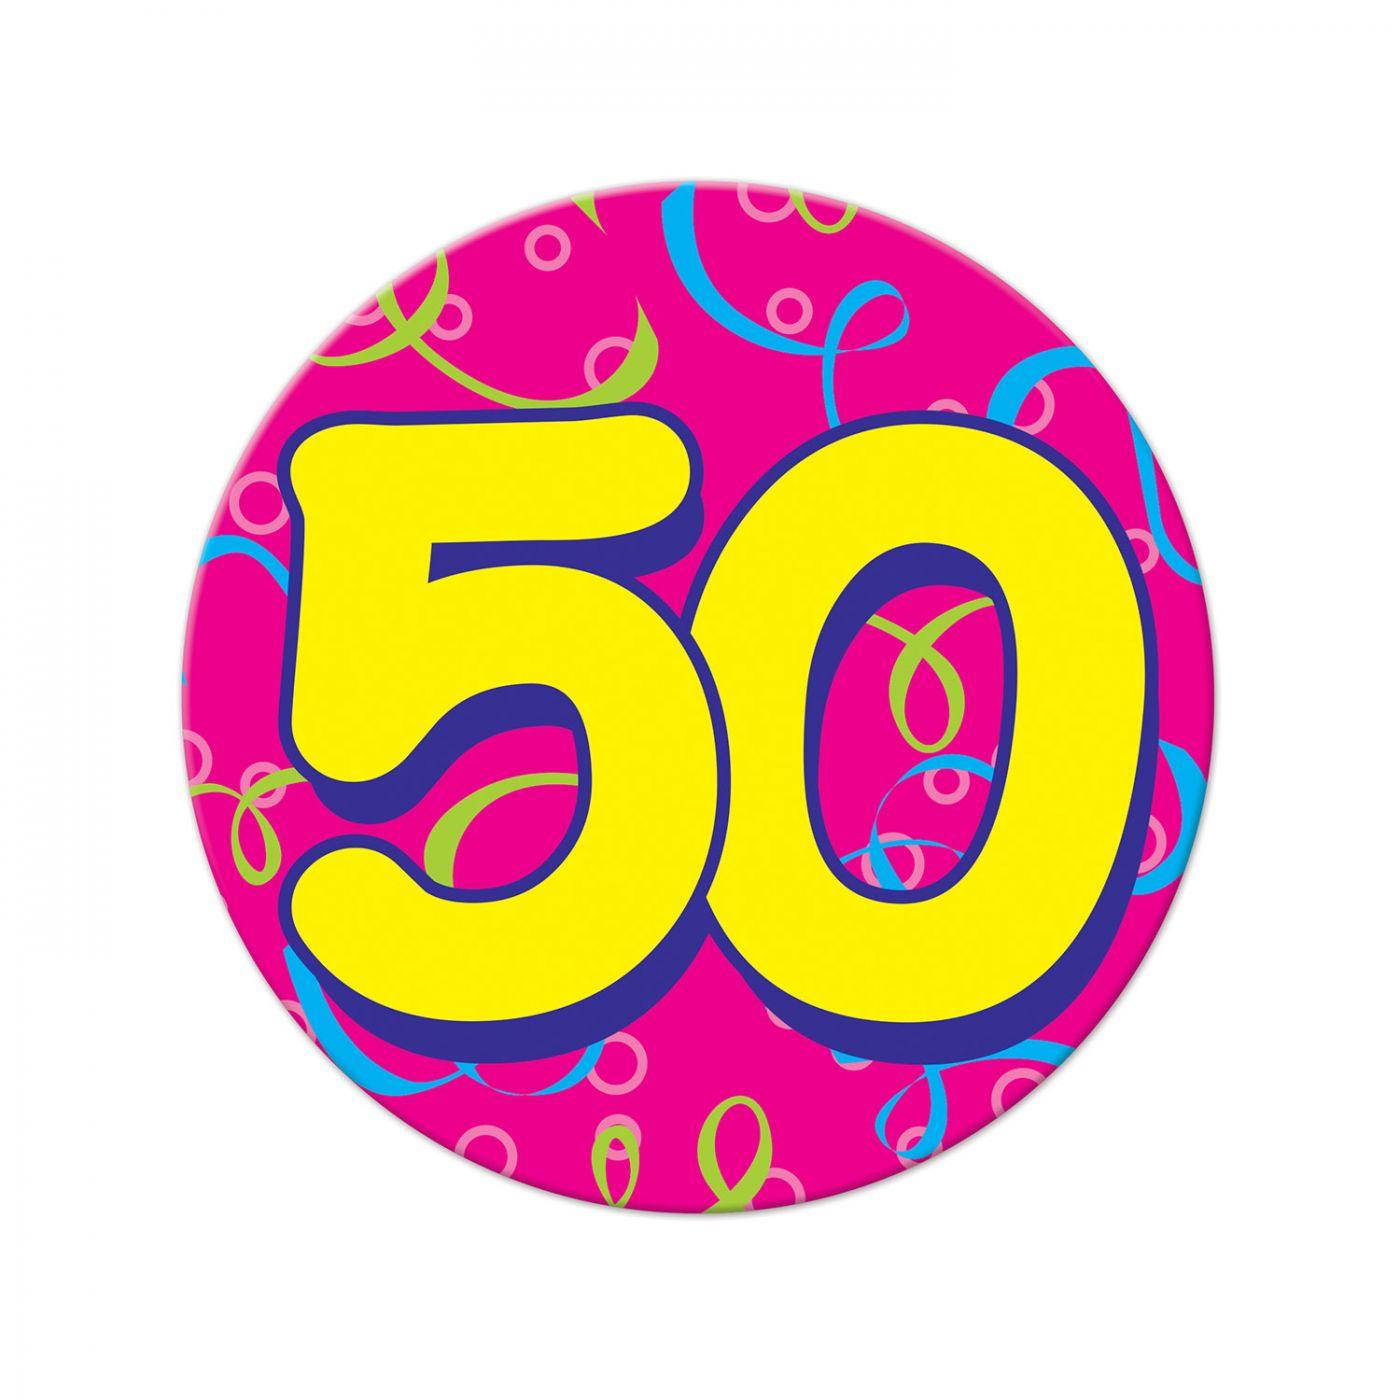 Jumbo  50  Button image